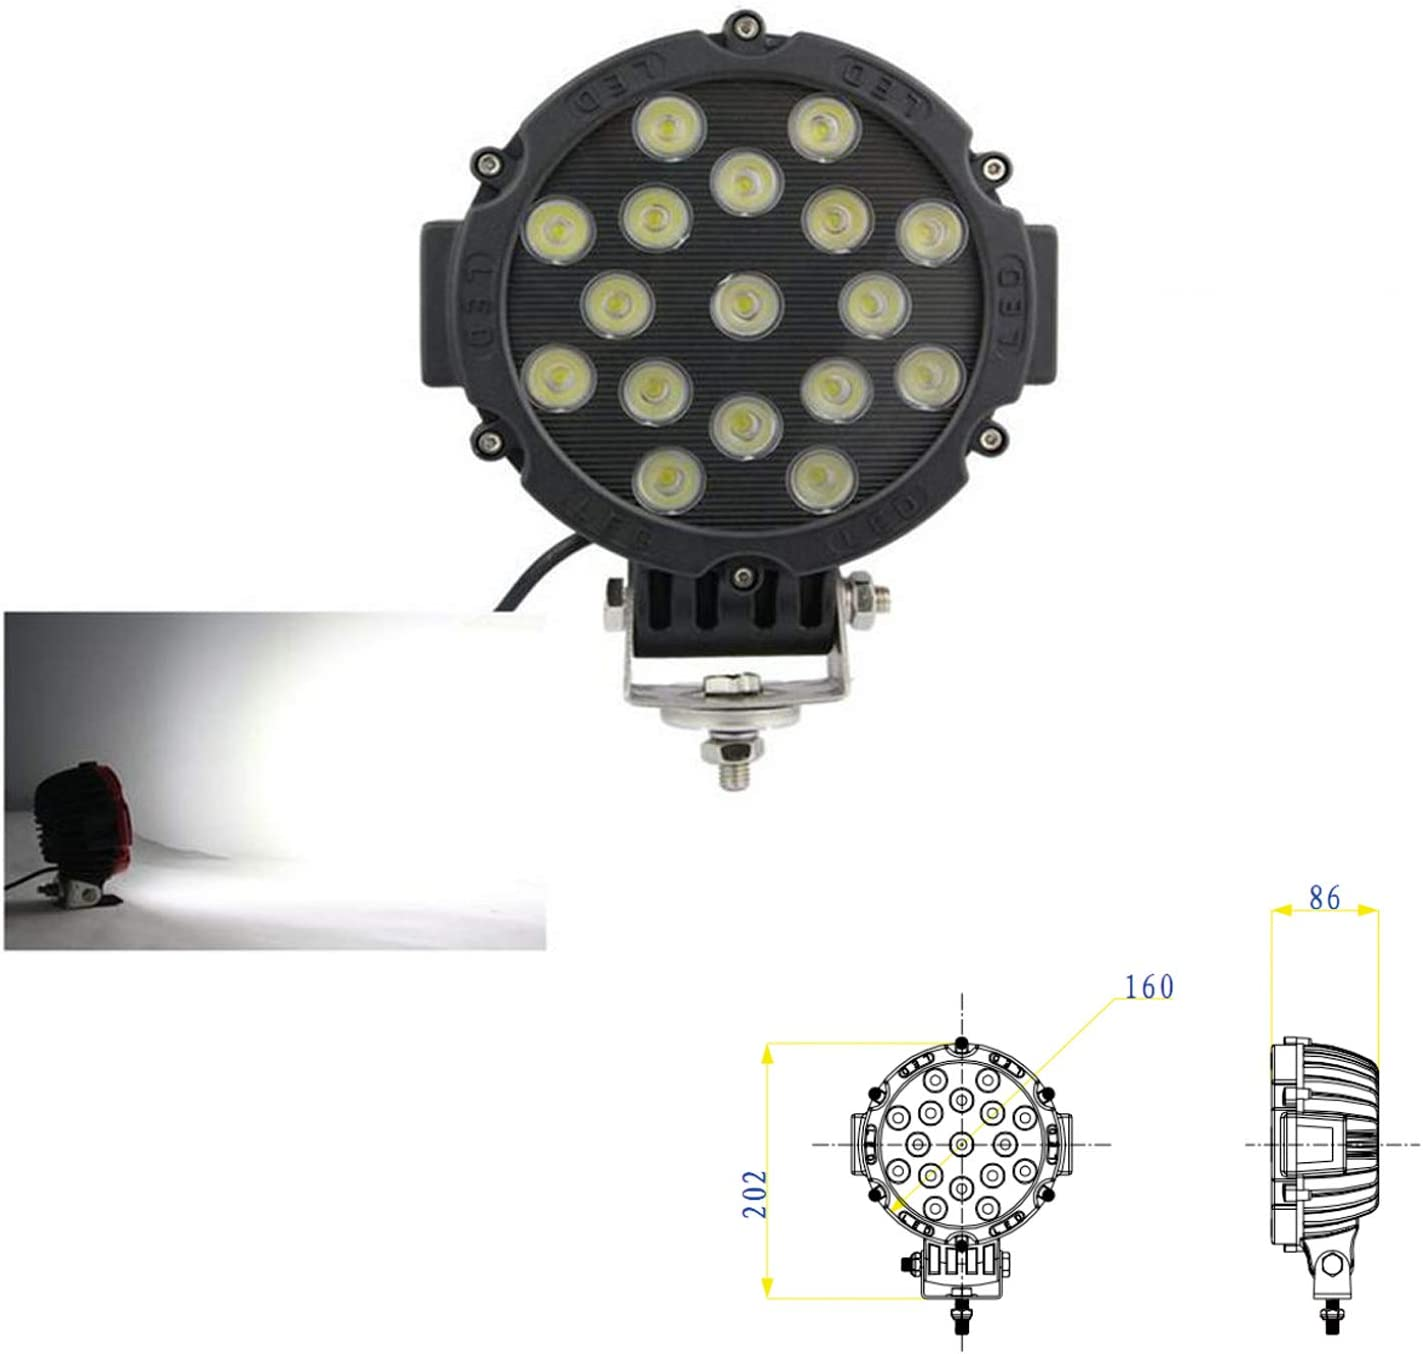 SXMA 7 pulgadas 51W Luz de trabajo LED redonda Faros delanteros Viga de inundación Luces LED impermeables para 4x4 Offroad Truck Tractor ATV SUV ...